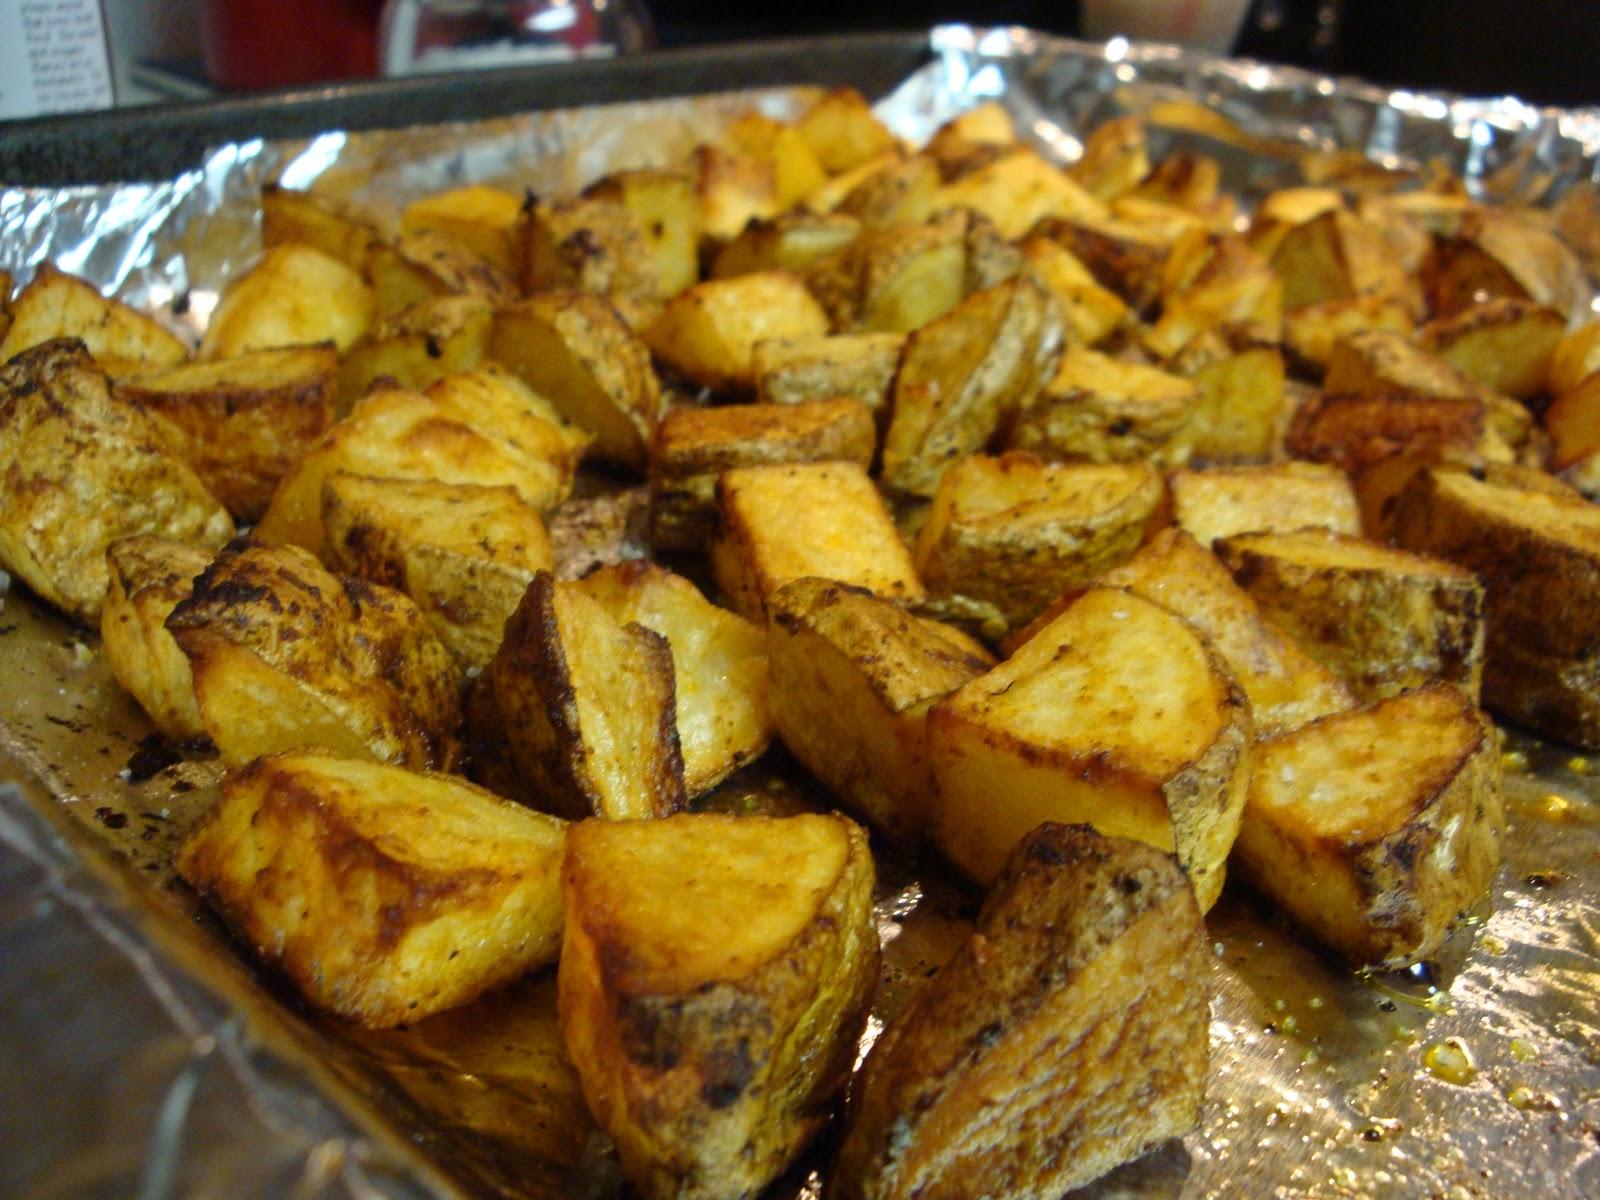 See? Easy potatoes.